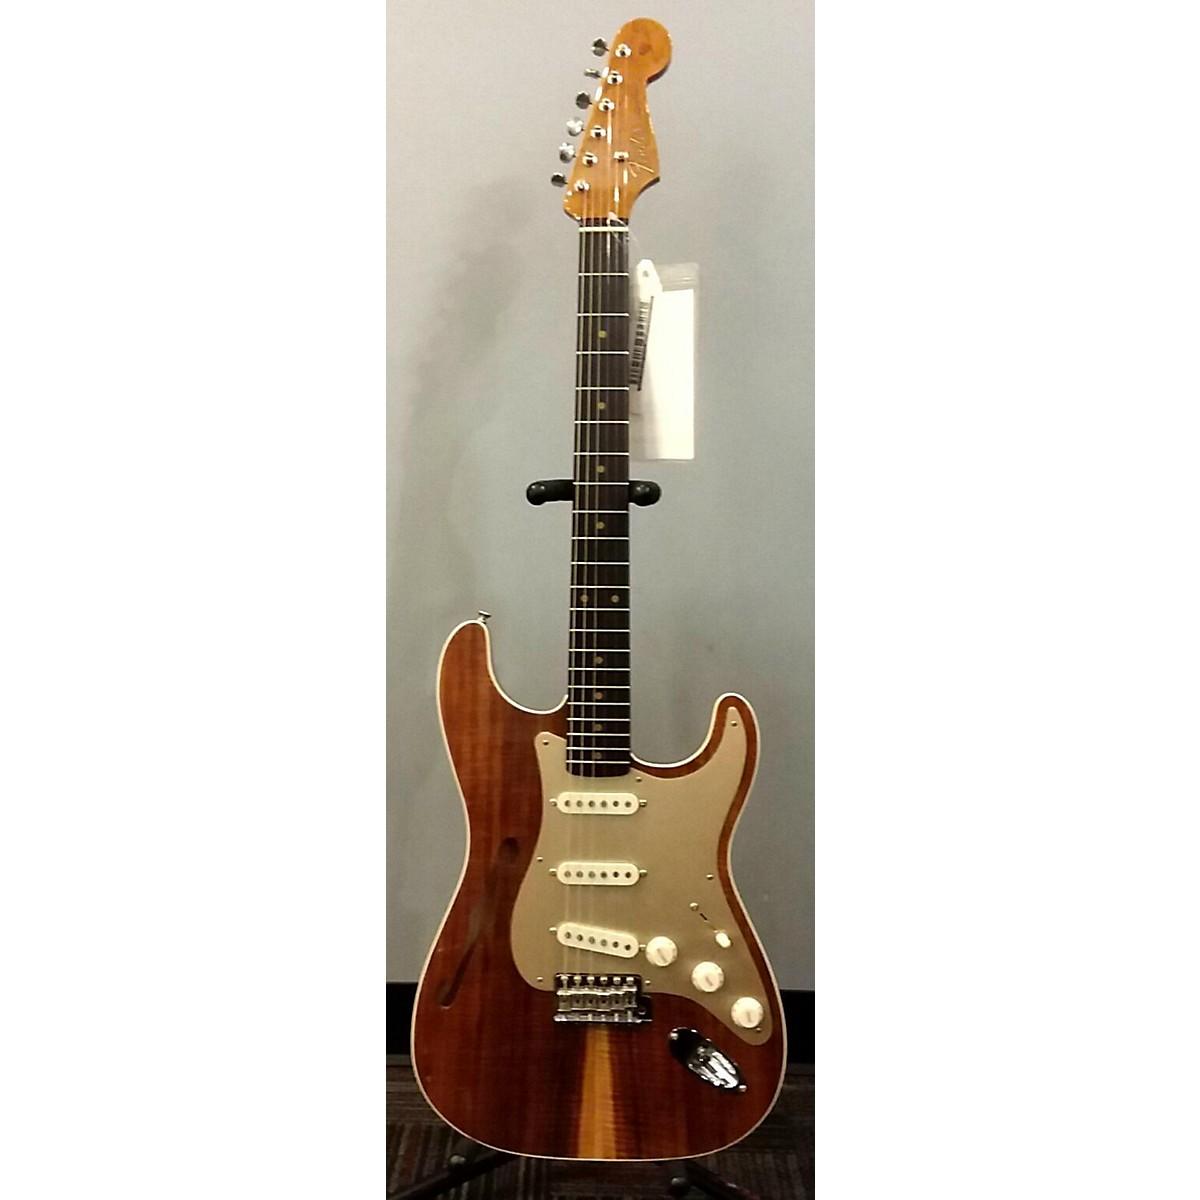 Fender Custom Shop Artisan Thinline Stratocaster Hollow Body Electric Guitar